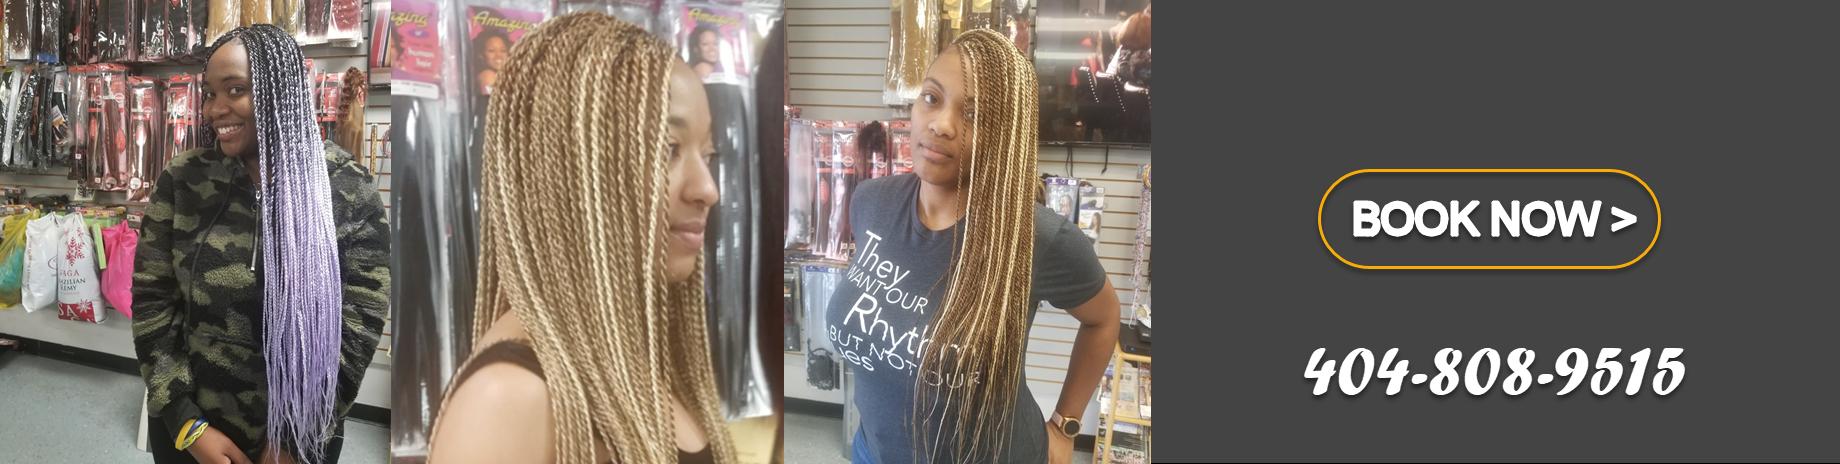 #1 Top African Hair Braiding Decatur GA, Best African Hair Braiding near Decatur GA, Hair Braiding in Decatur Georgia